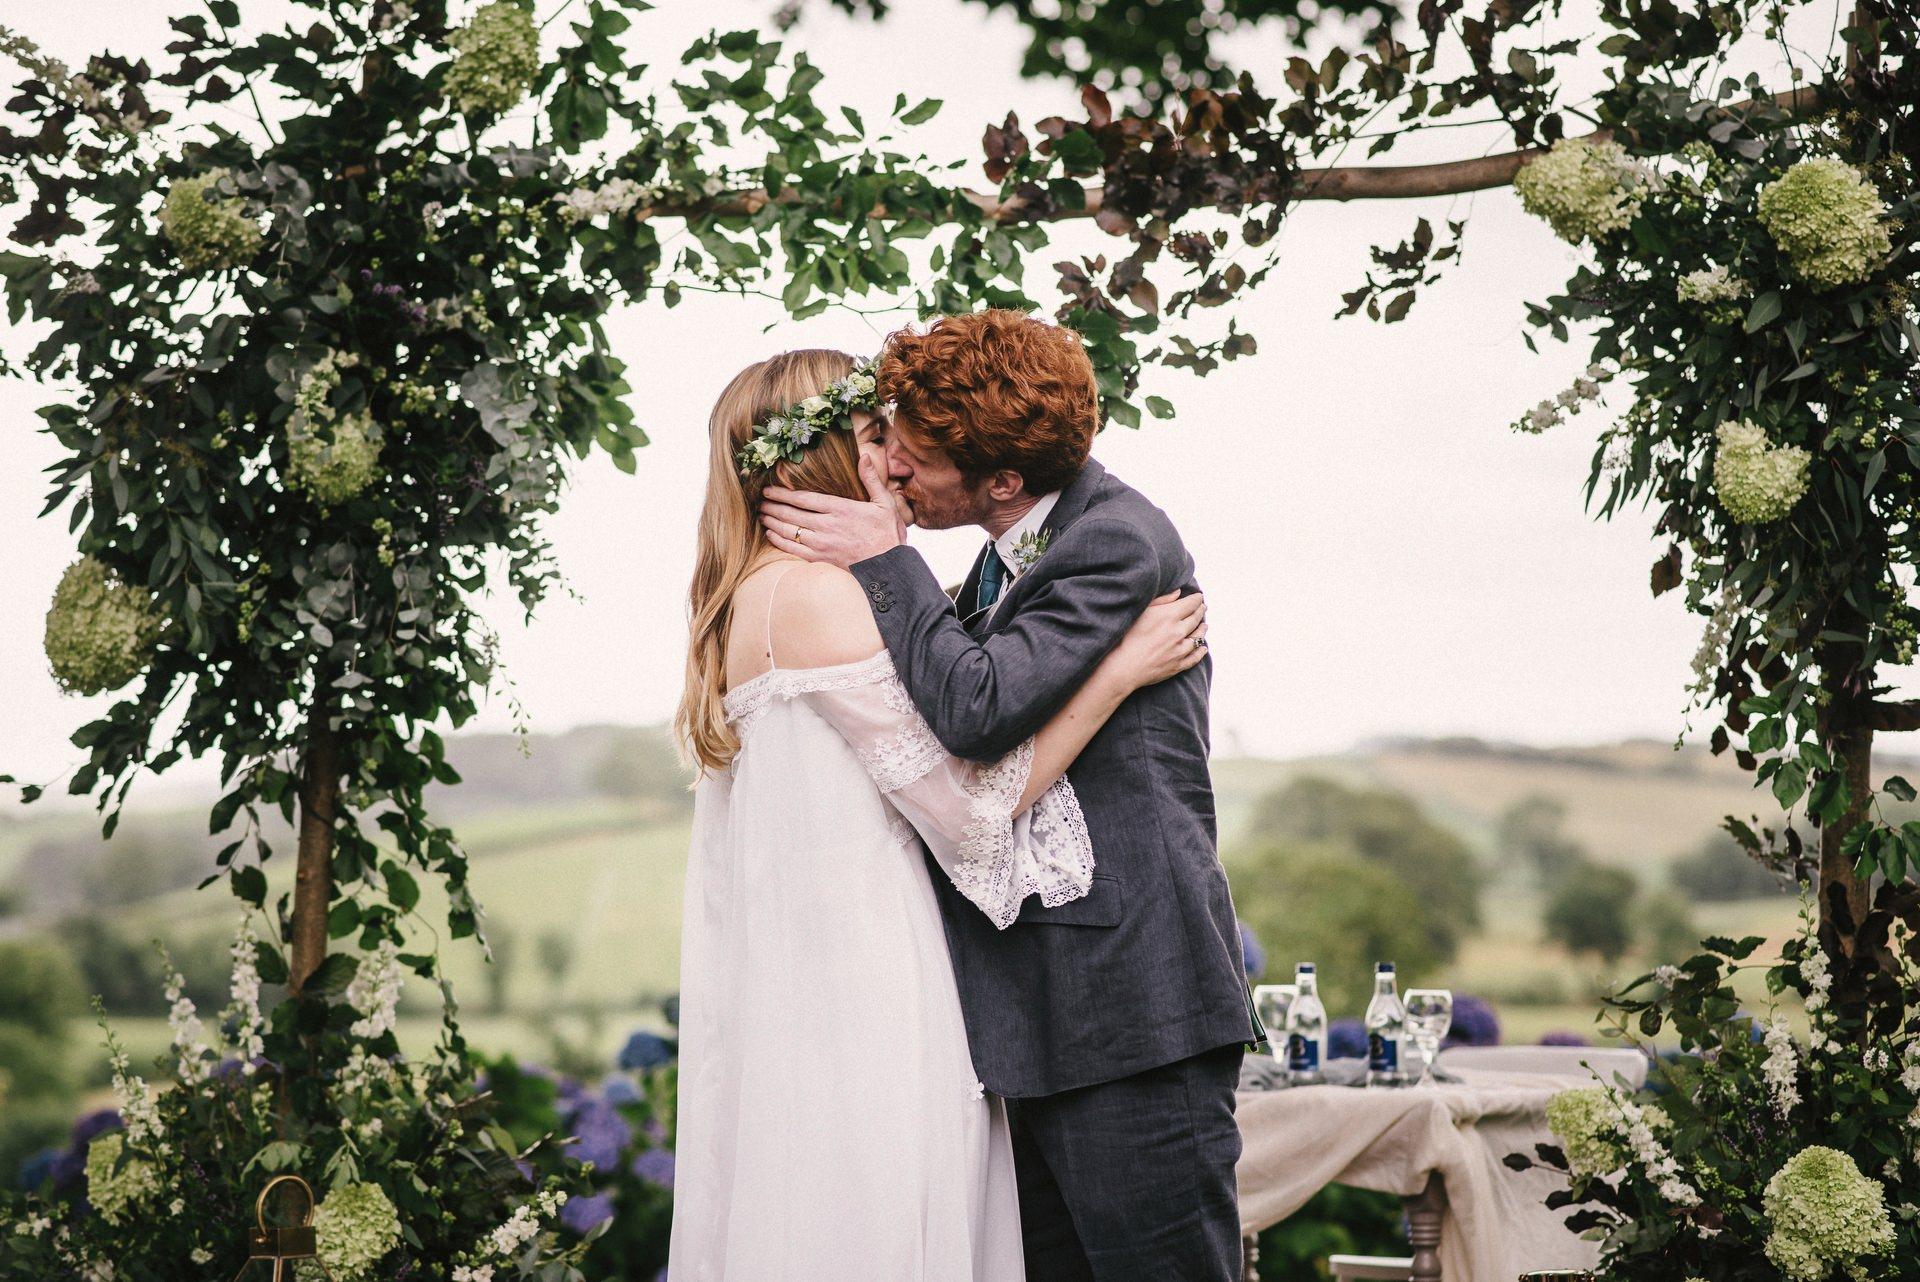 wedding at tullyveery house042.JPG